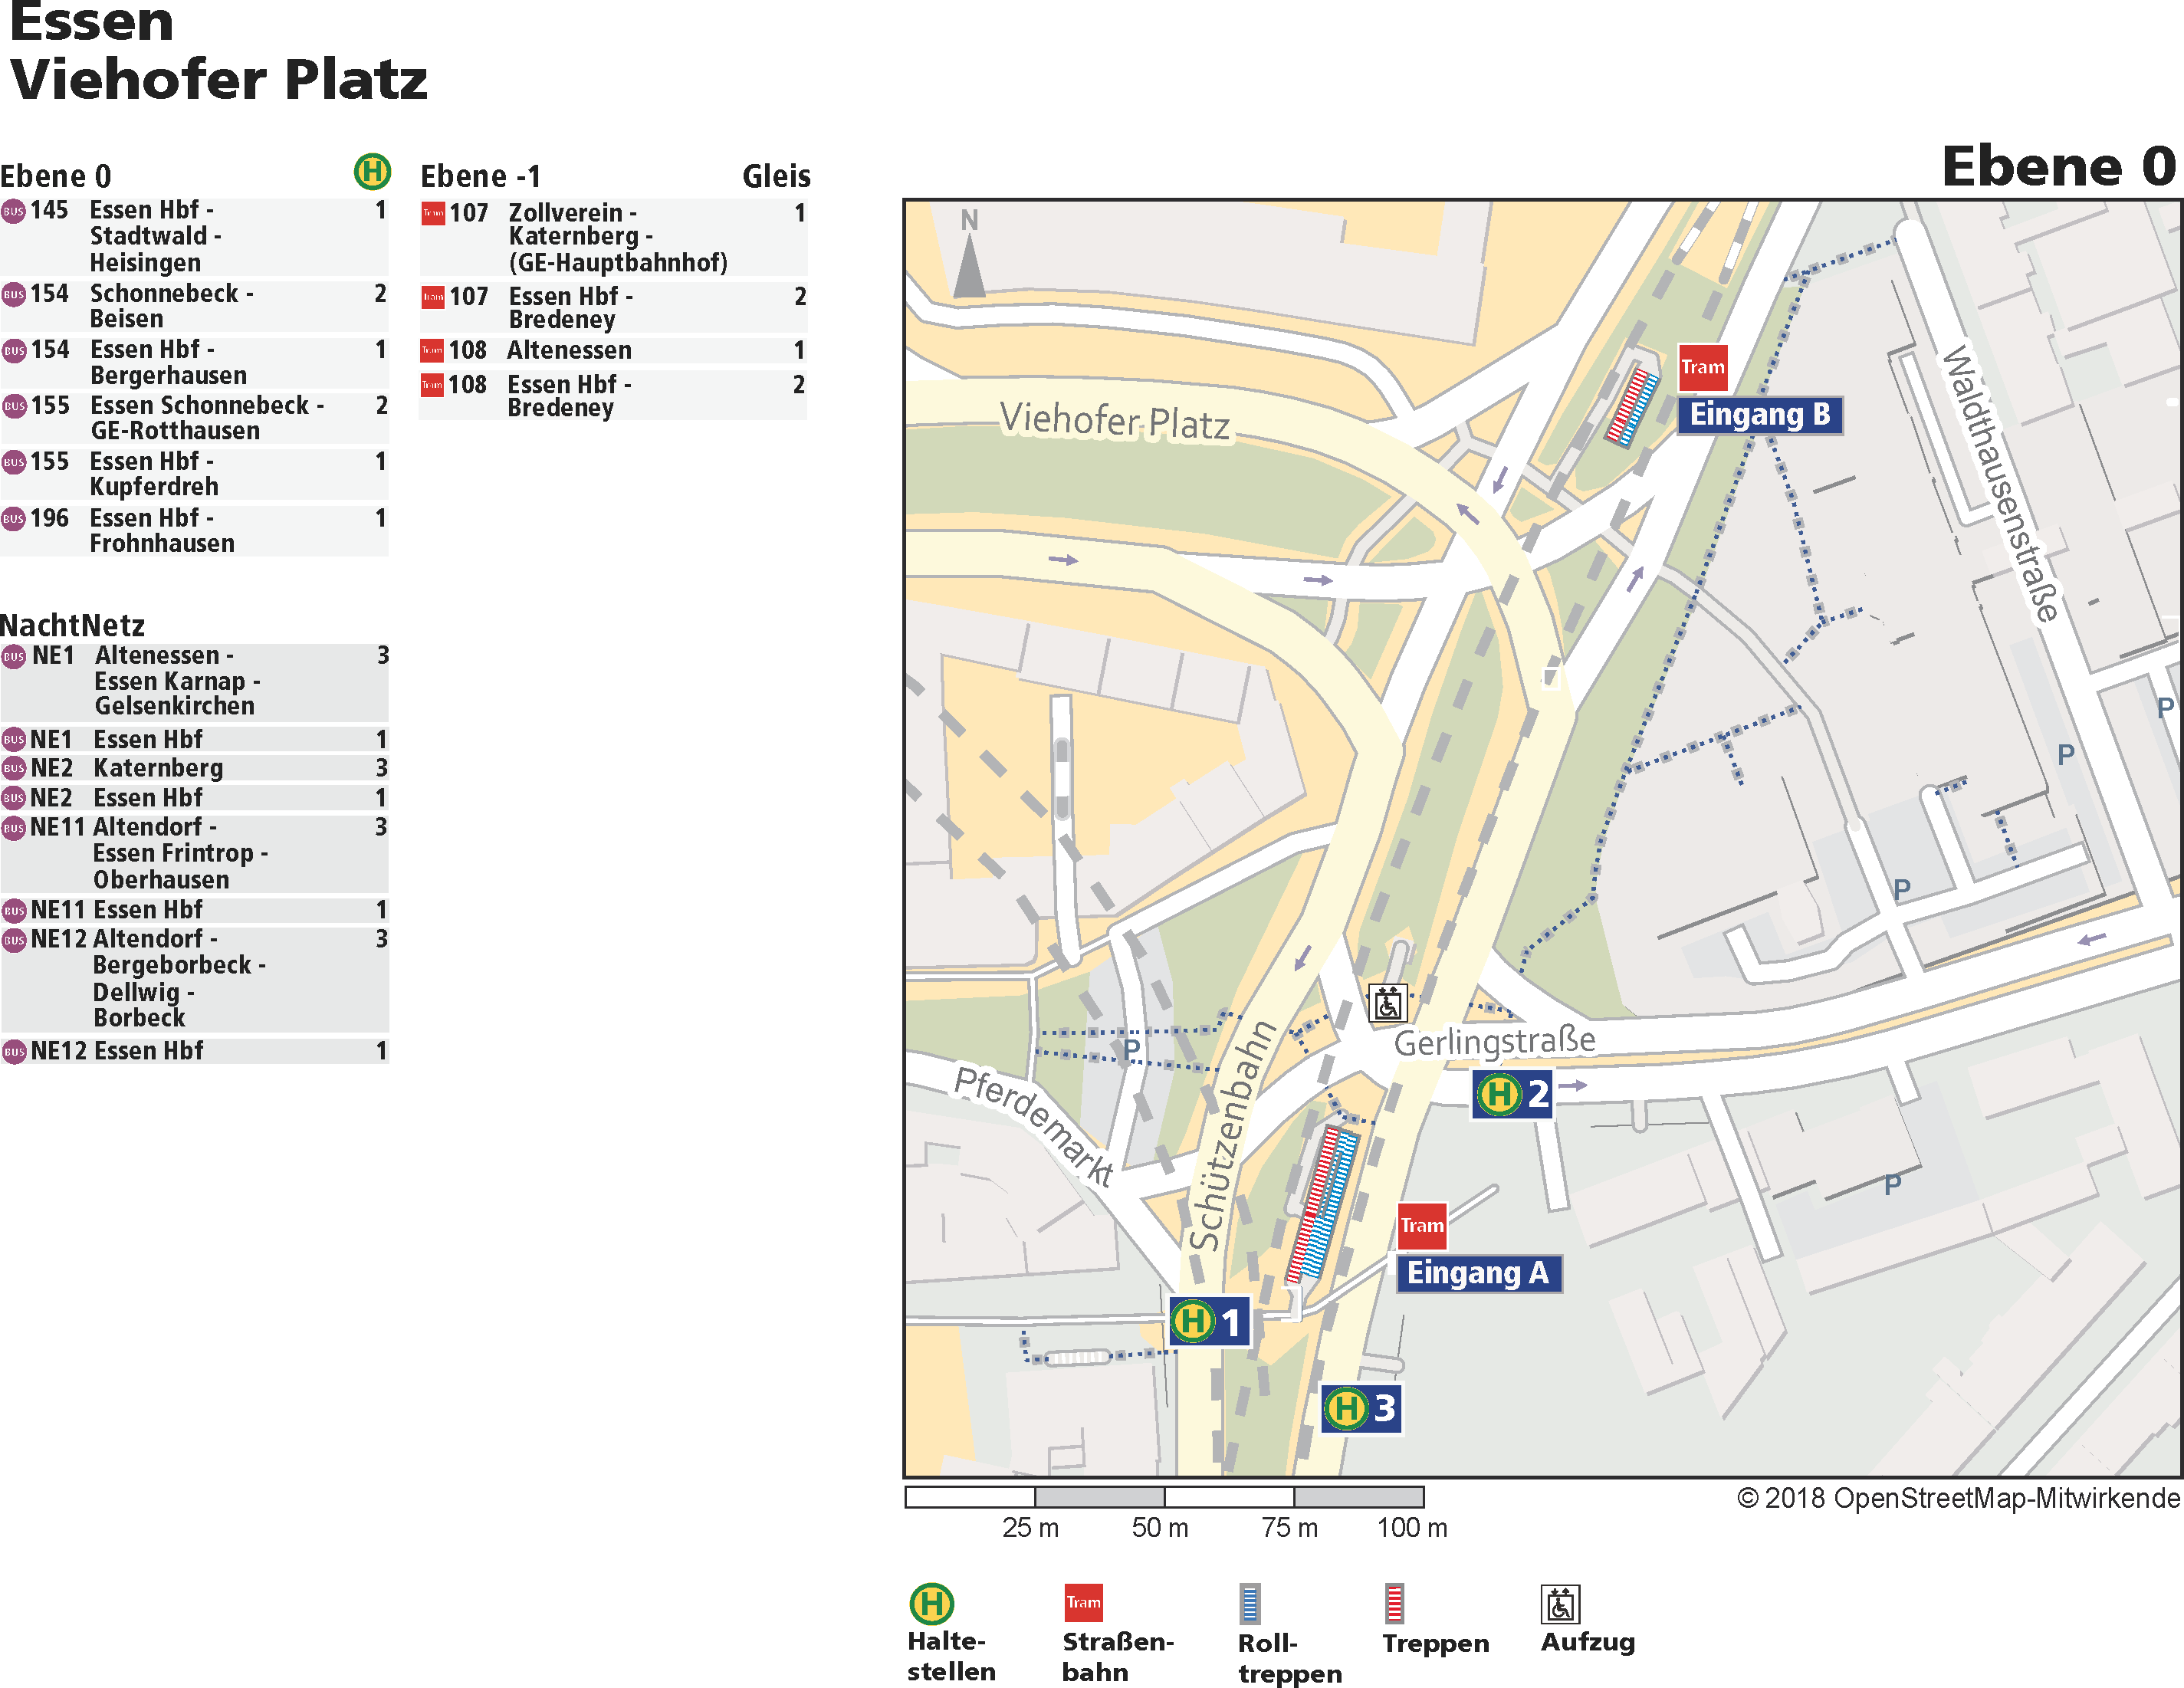 Haltestellenplan